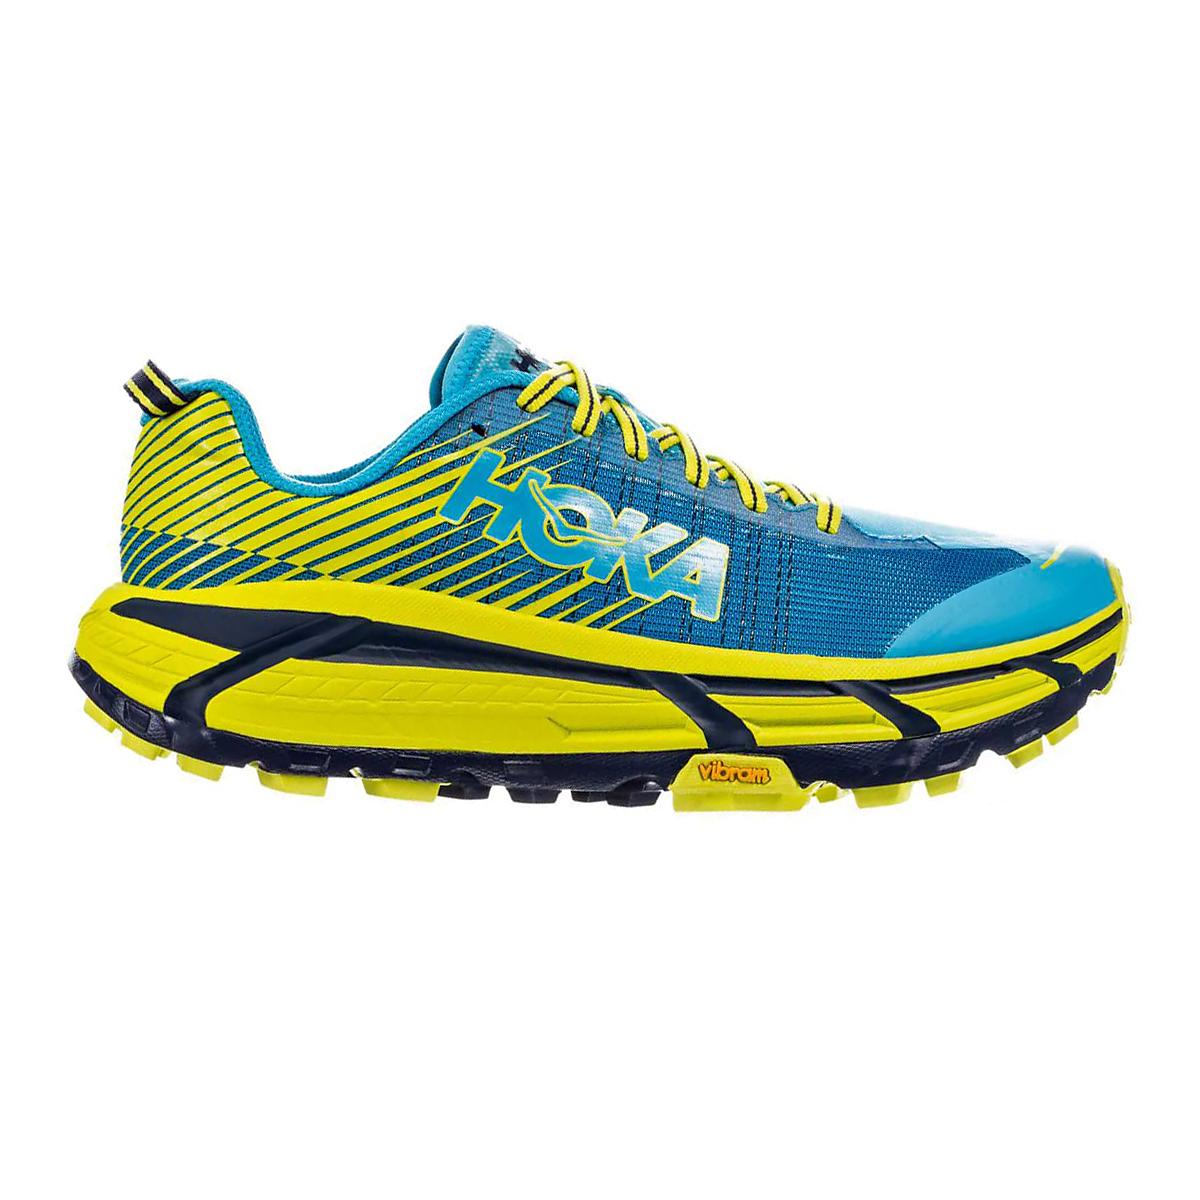 Men's Hoka One One Evo Mafate 2 Running Shoe - Color: Cyan/Citrus - Size: 7 - Width: Regular, Cyan/Citrus, large, image 1